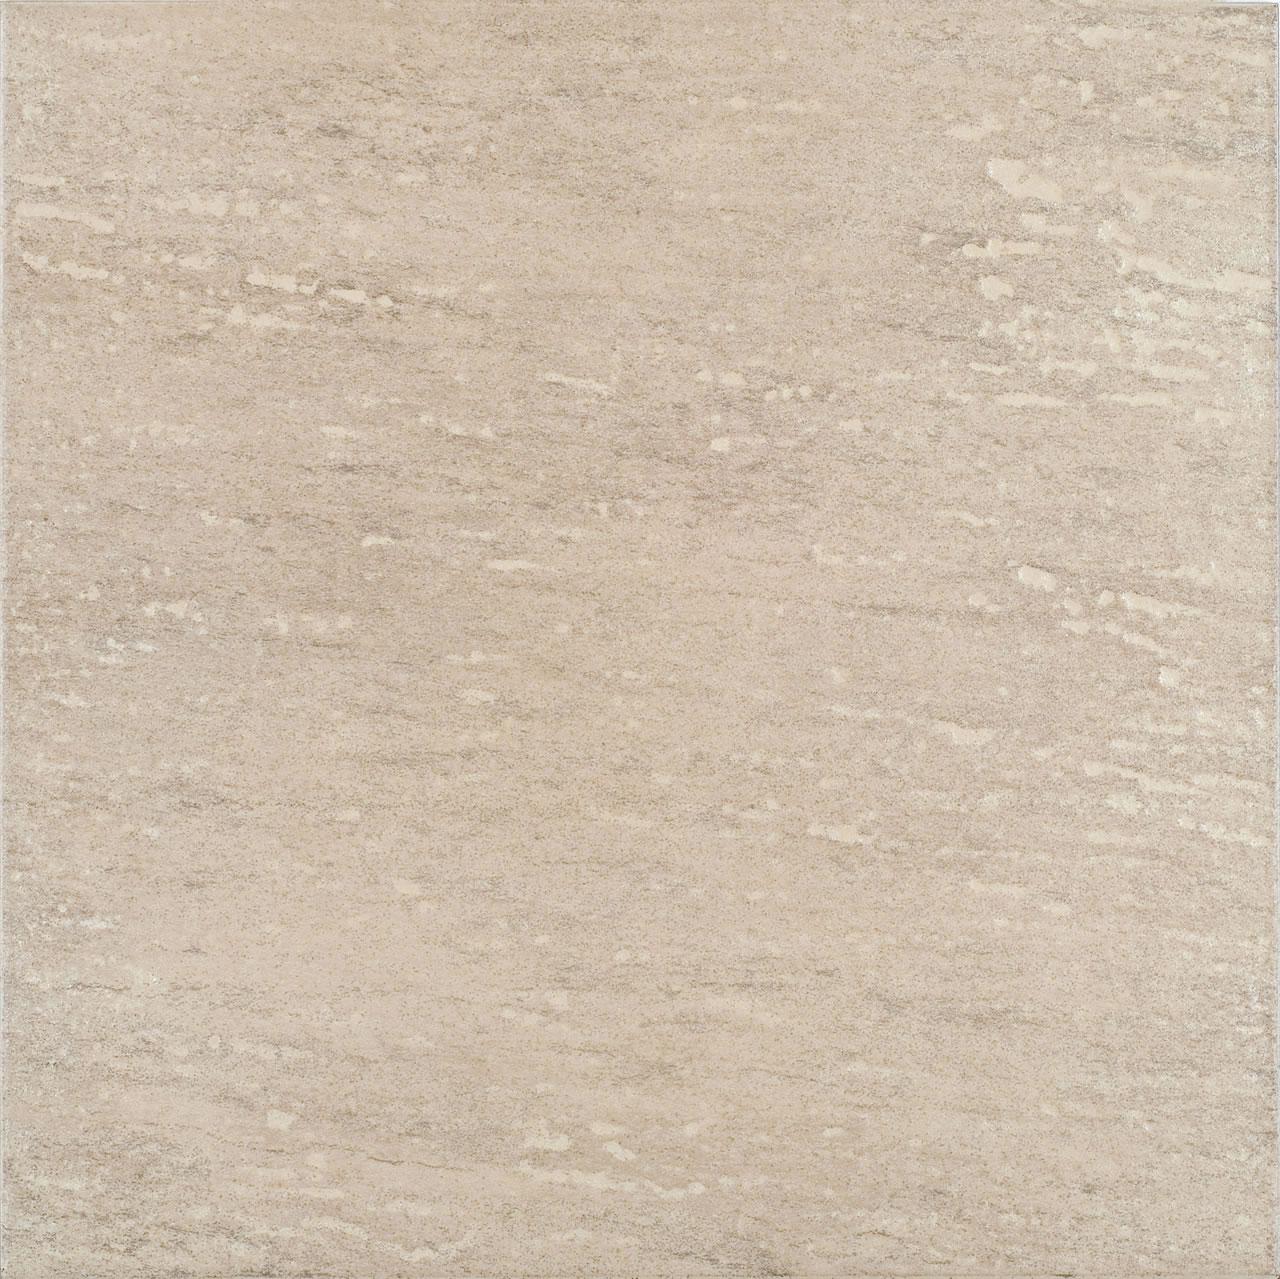 horus white 45×45